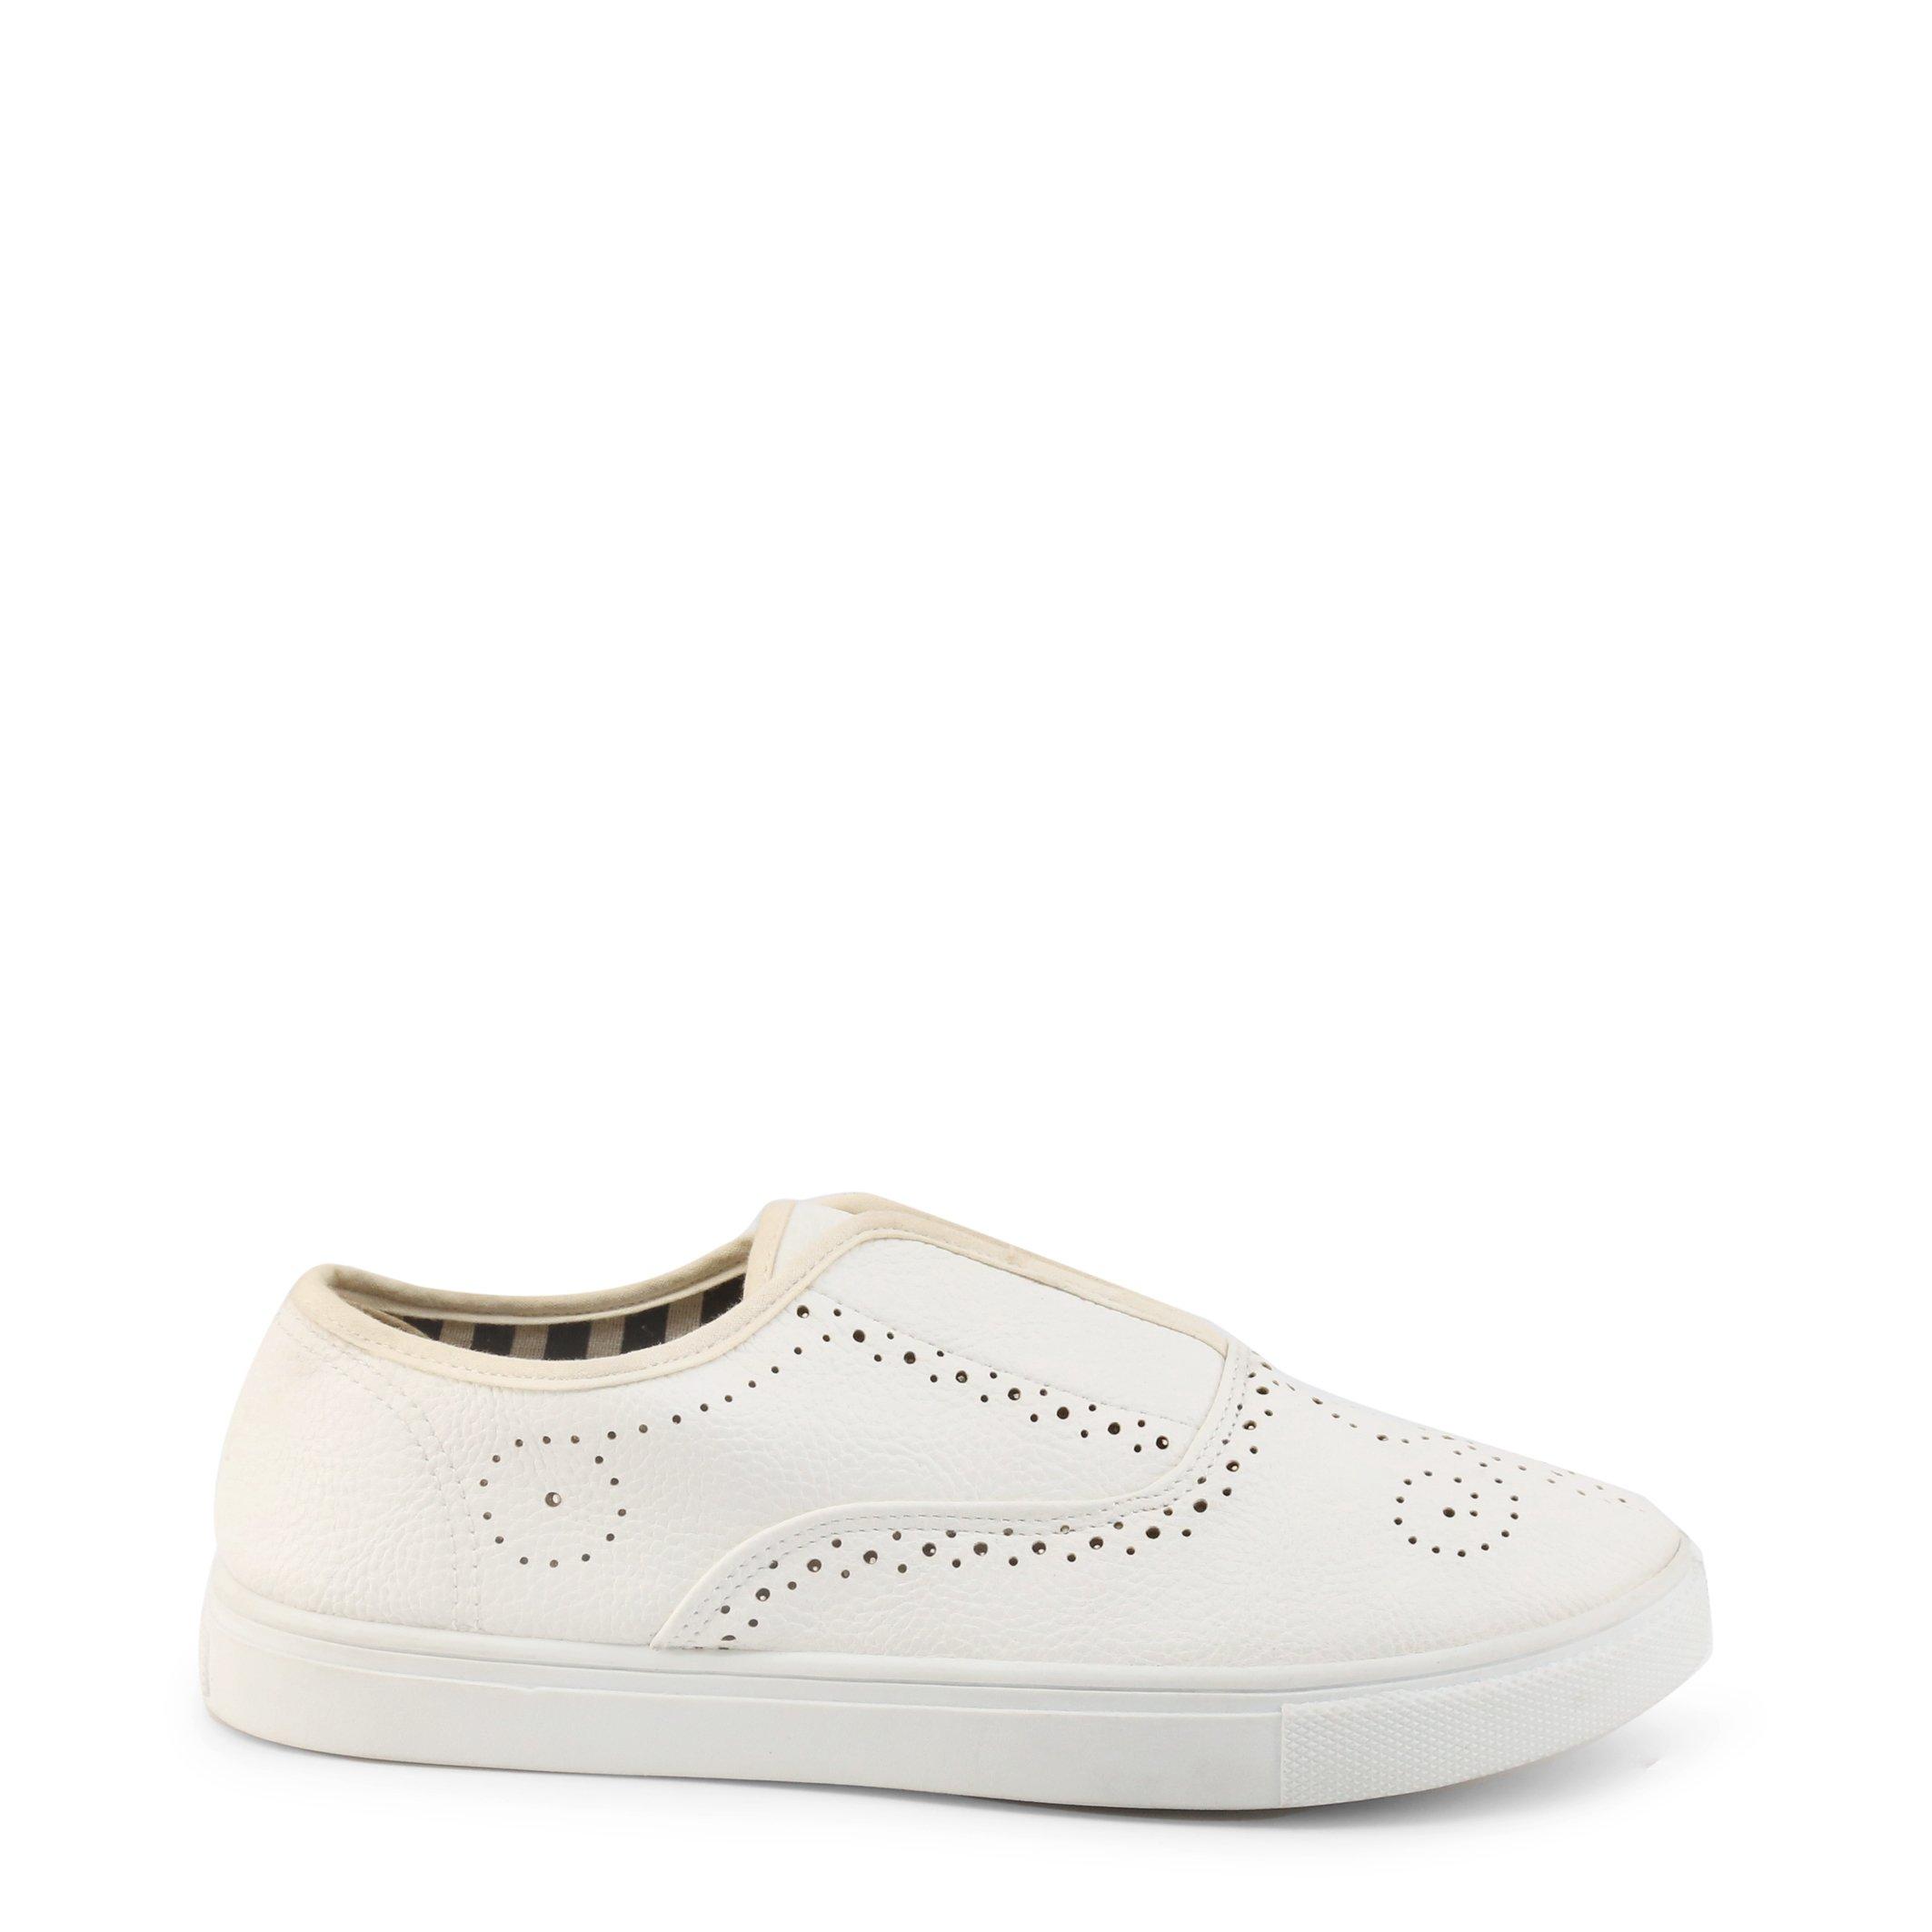 Roccobarocco Women's Slip On Shoe Various Colours RBSC1C701 - white EU 39